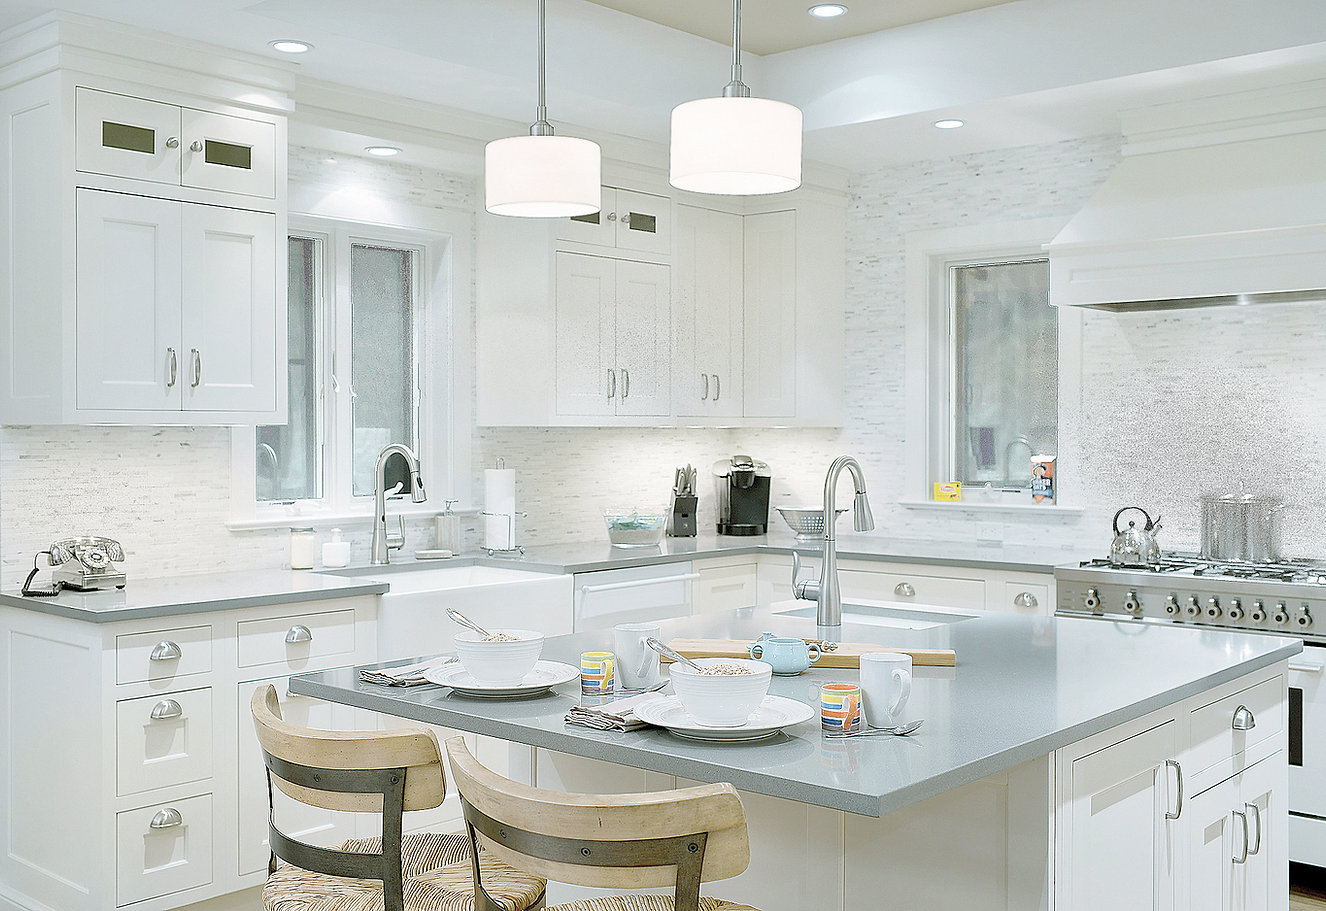 Barbrack Kitchen.jpg